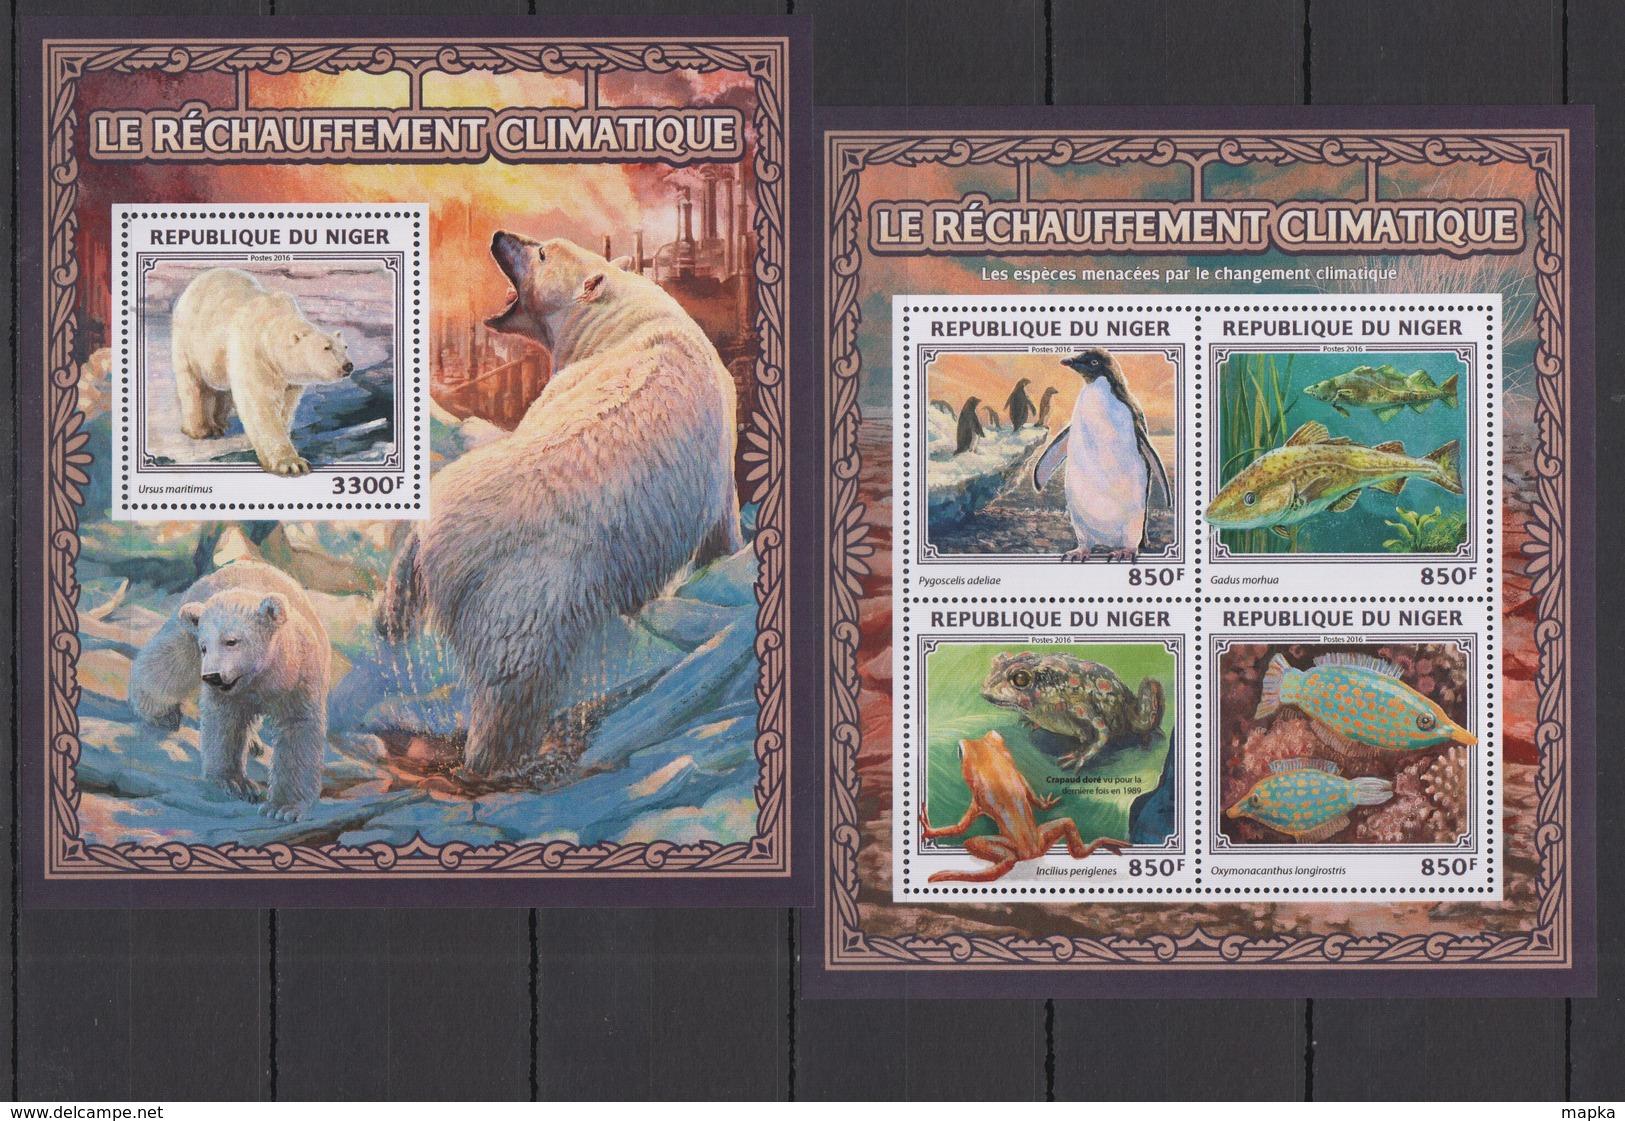 ST1897 2016 NIGER FLORA & FAUNA ANIMALS NATURE GLOBAL WARMING CLIMATE CHANGE KB+BL MNH - Stamps